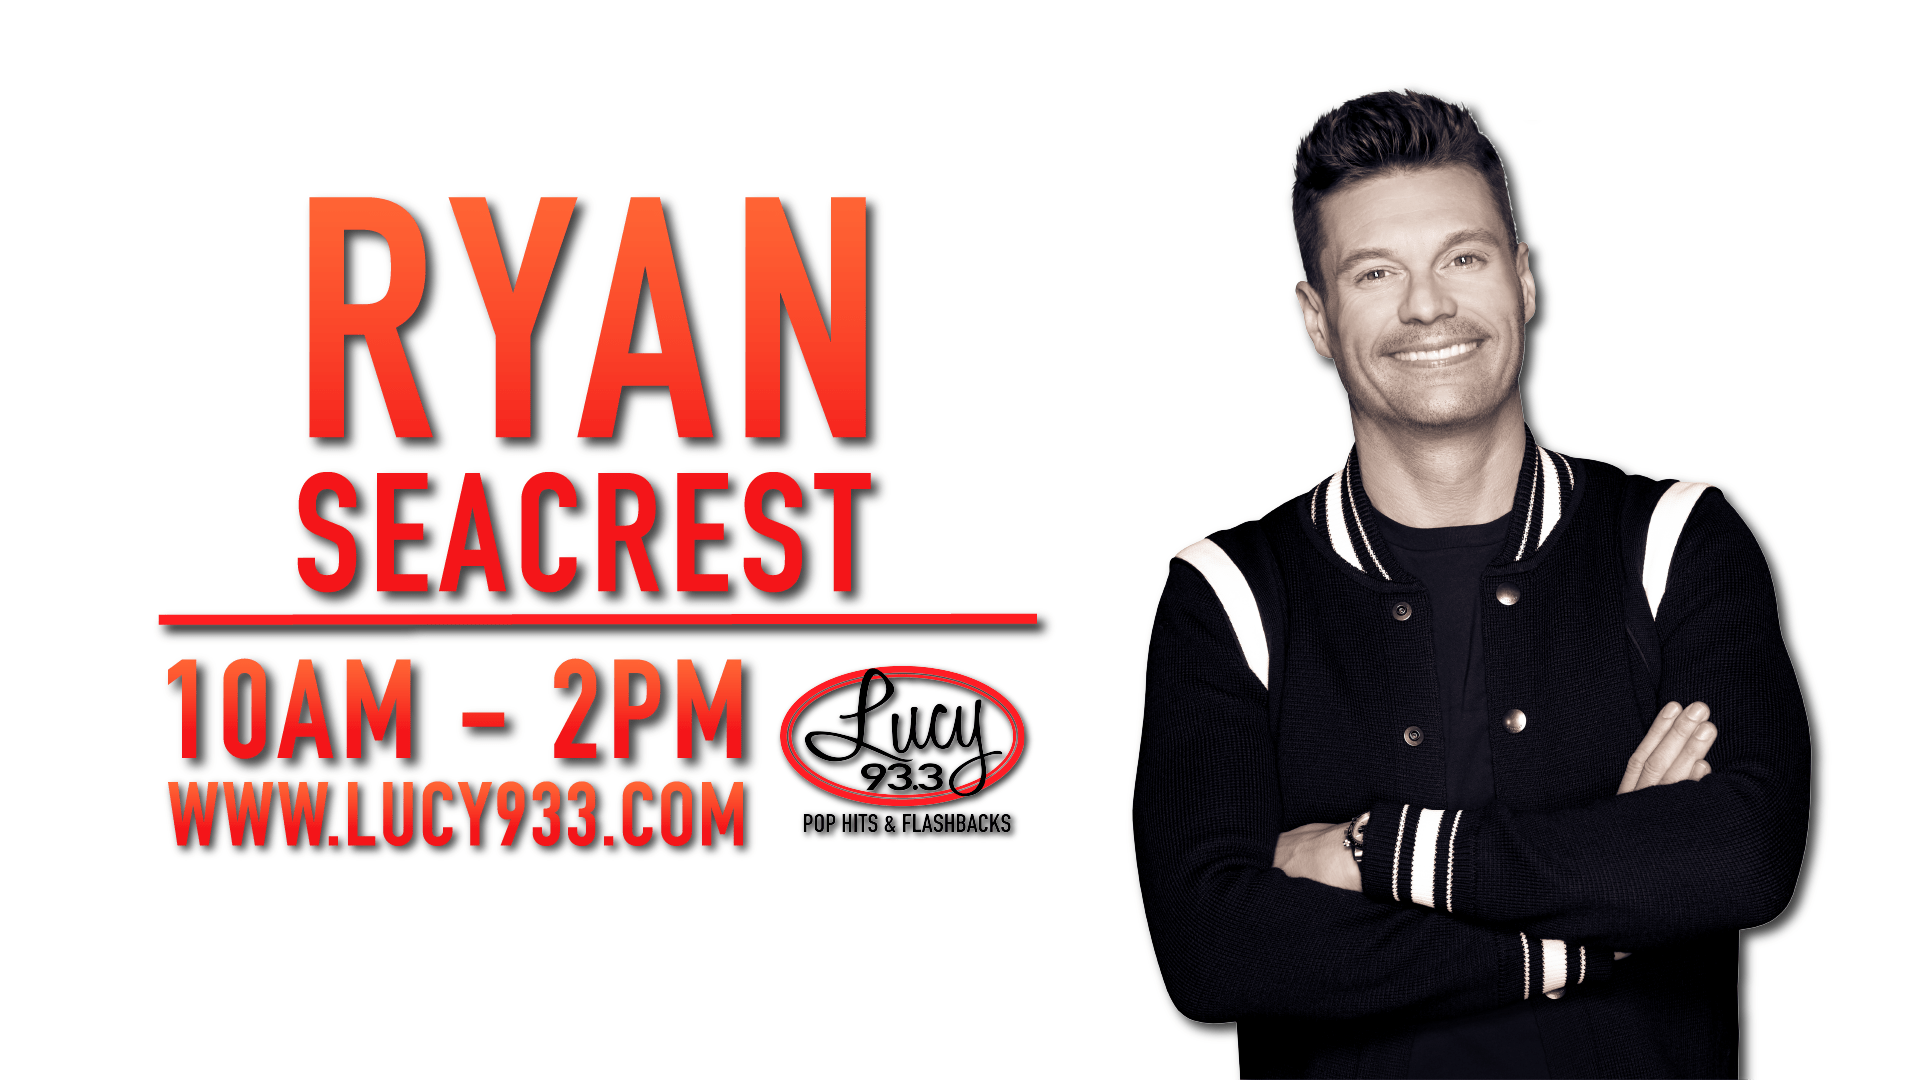 Ryan Seacrest 10am-2pm Lucy933